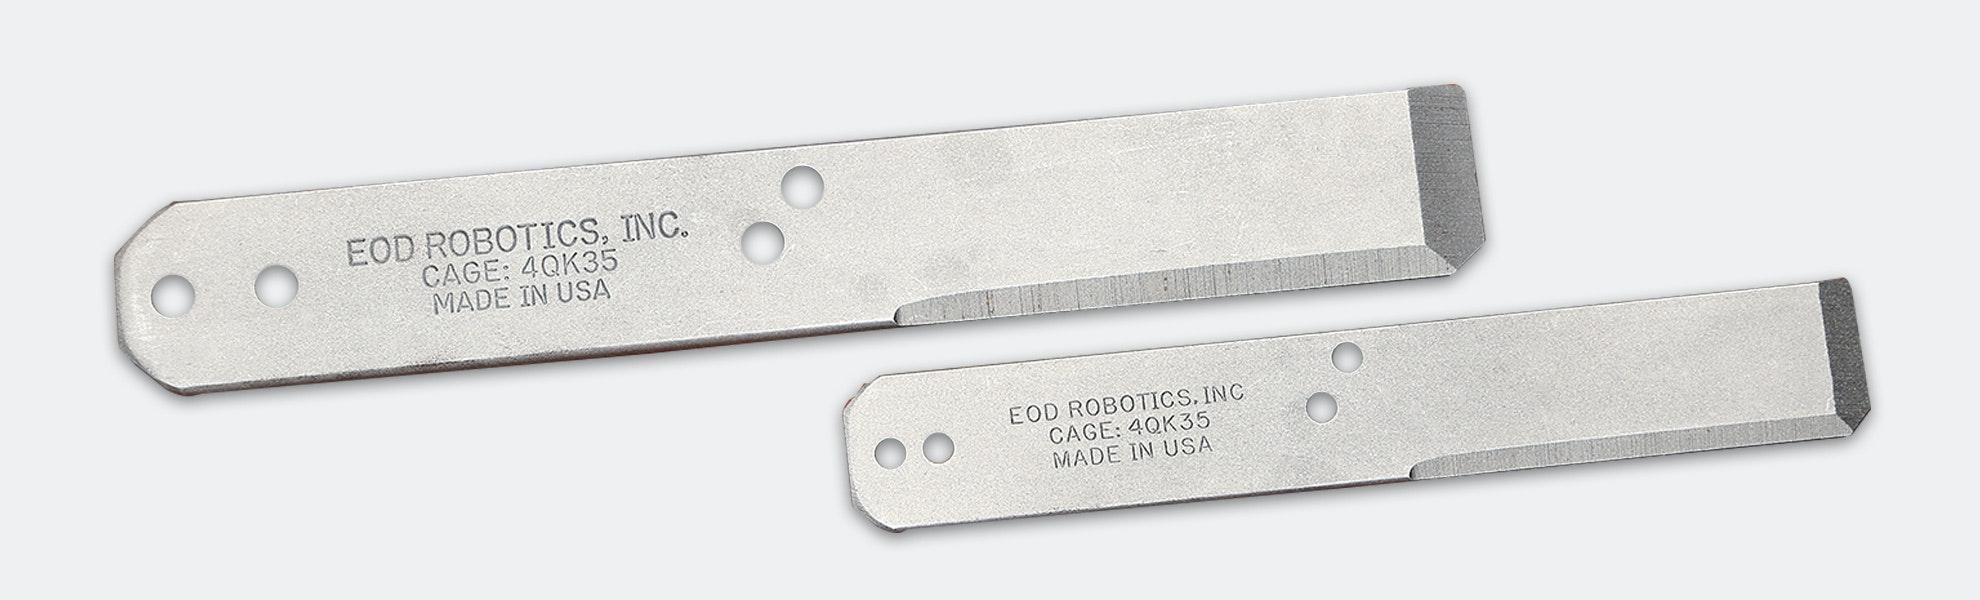 EOD Robotics Breacher Bar Set